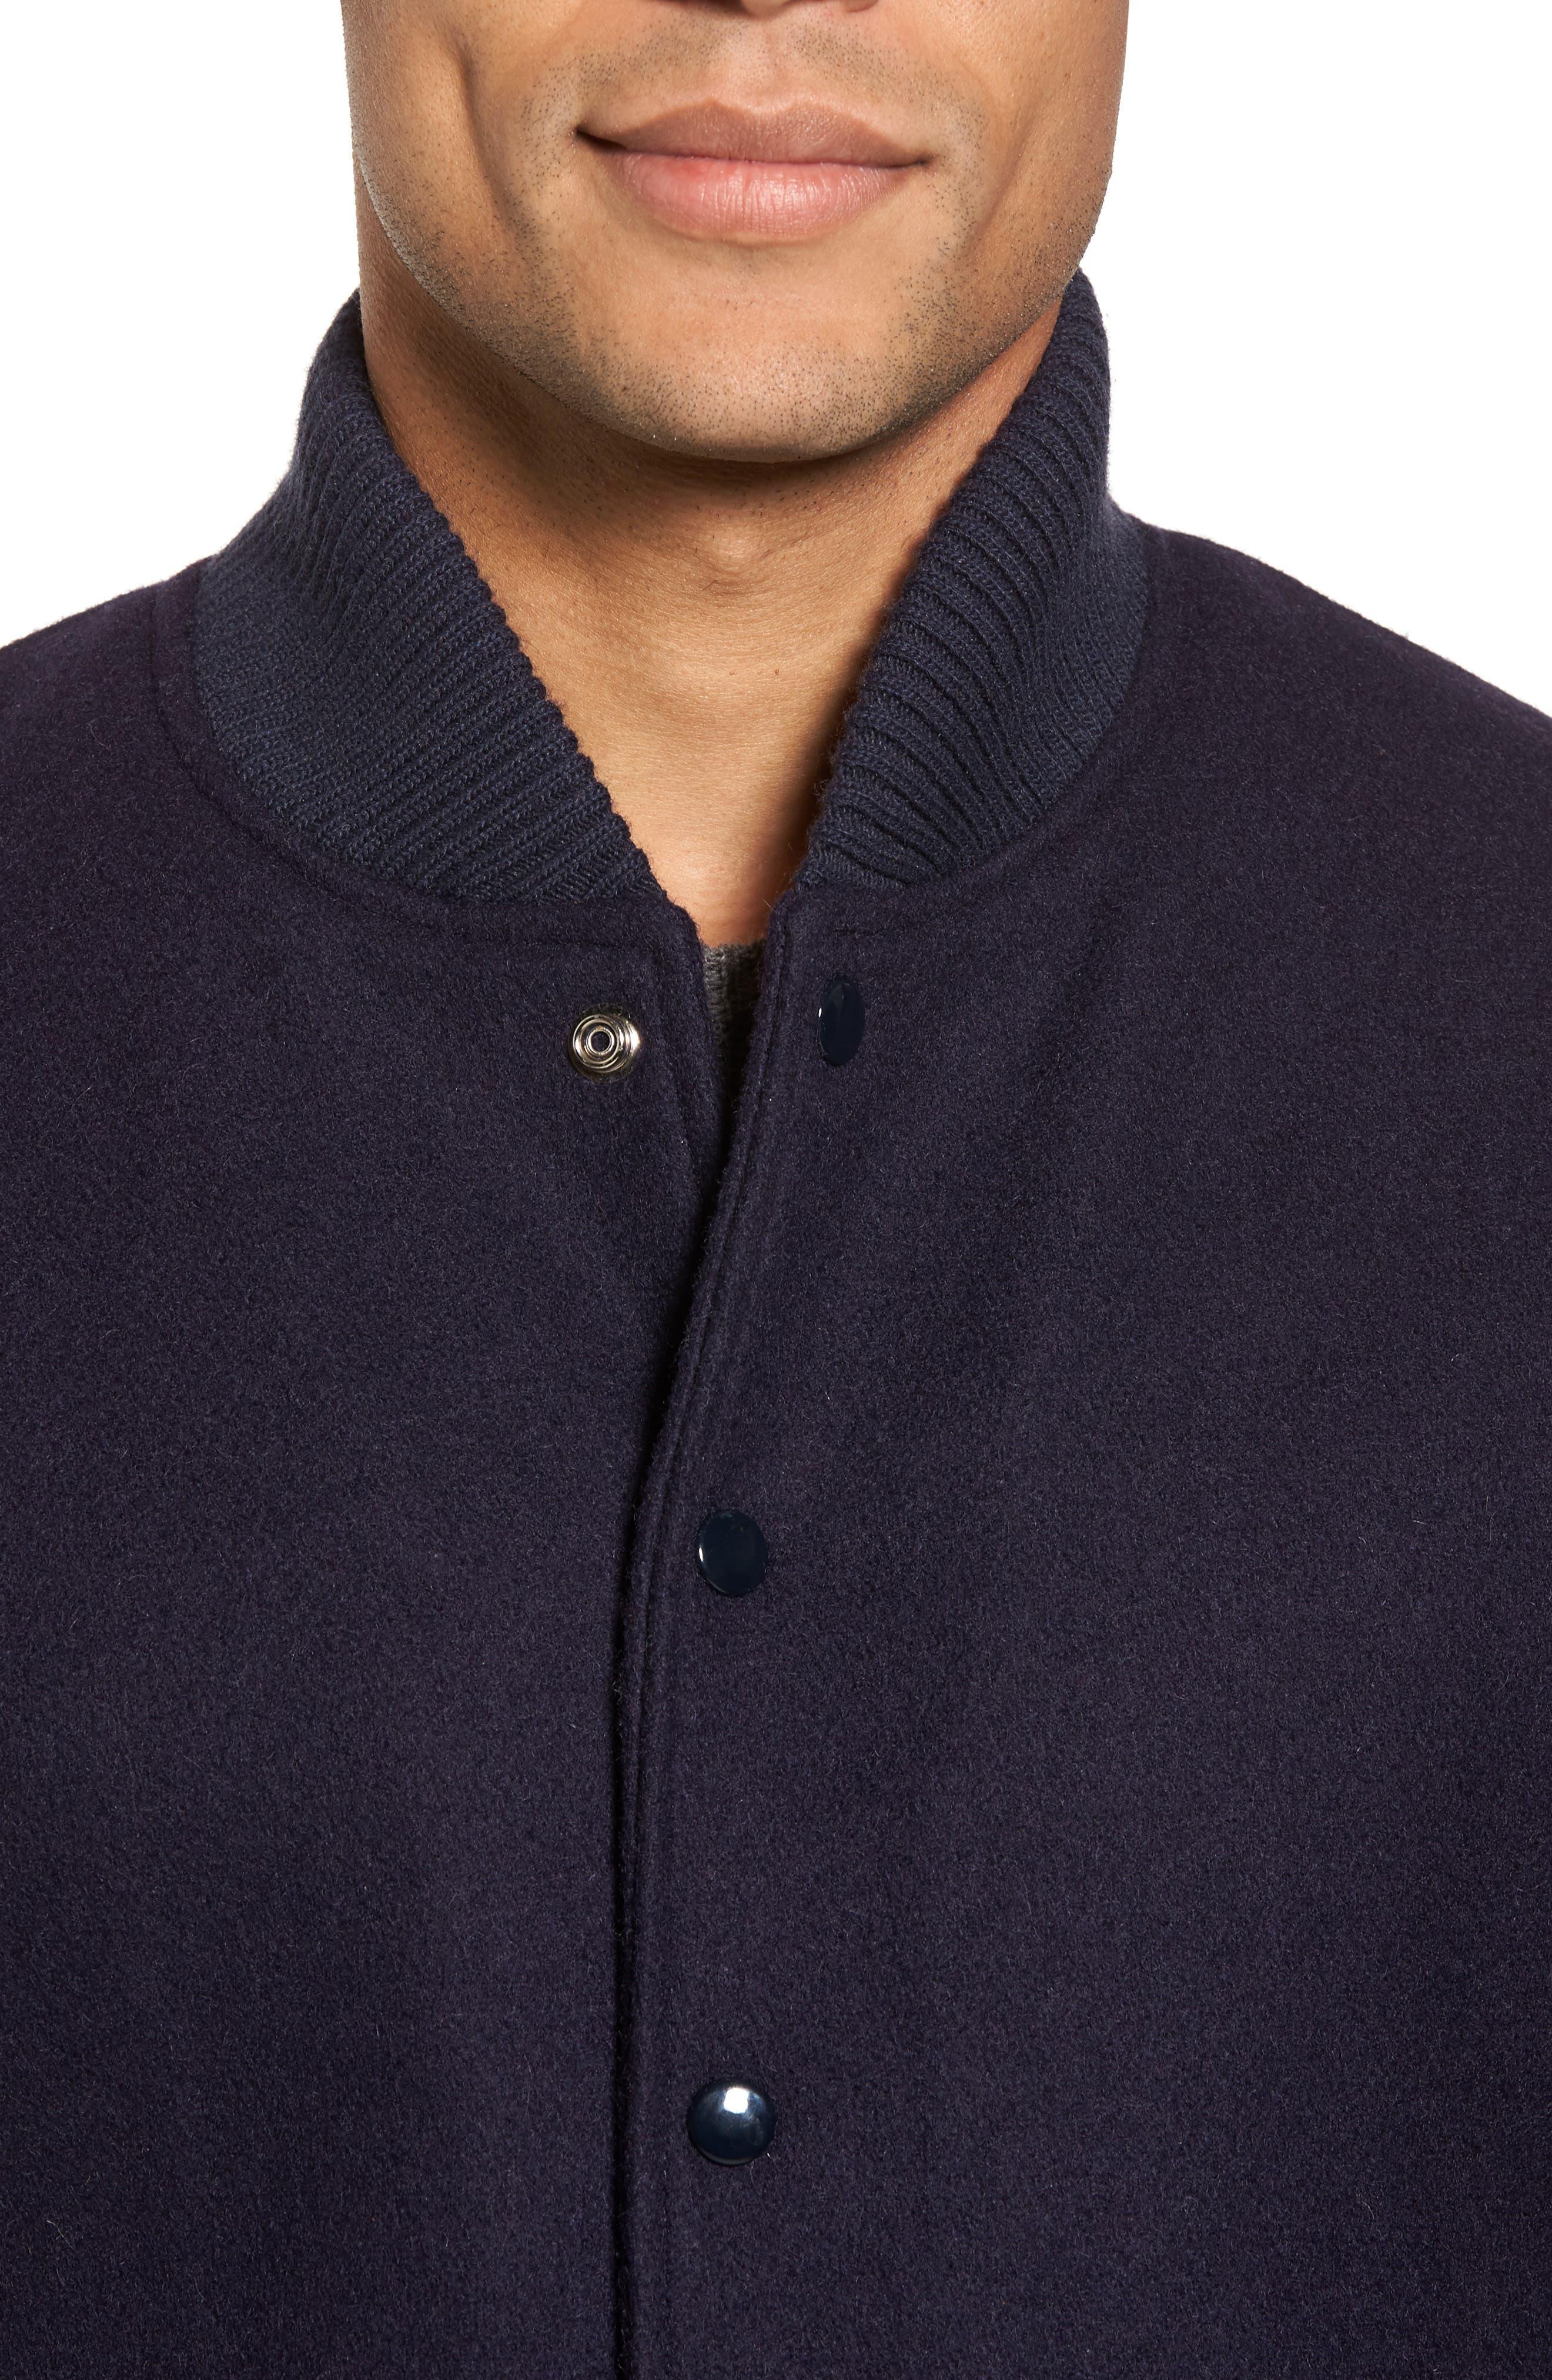 Classic Varsity Jacket,                             Alternate thumbnail 4, color,                             Navy